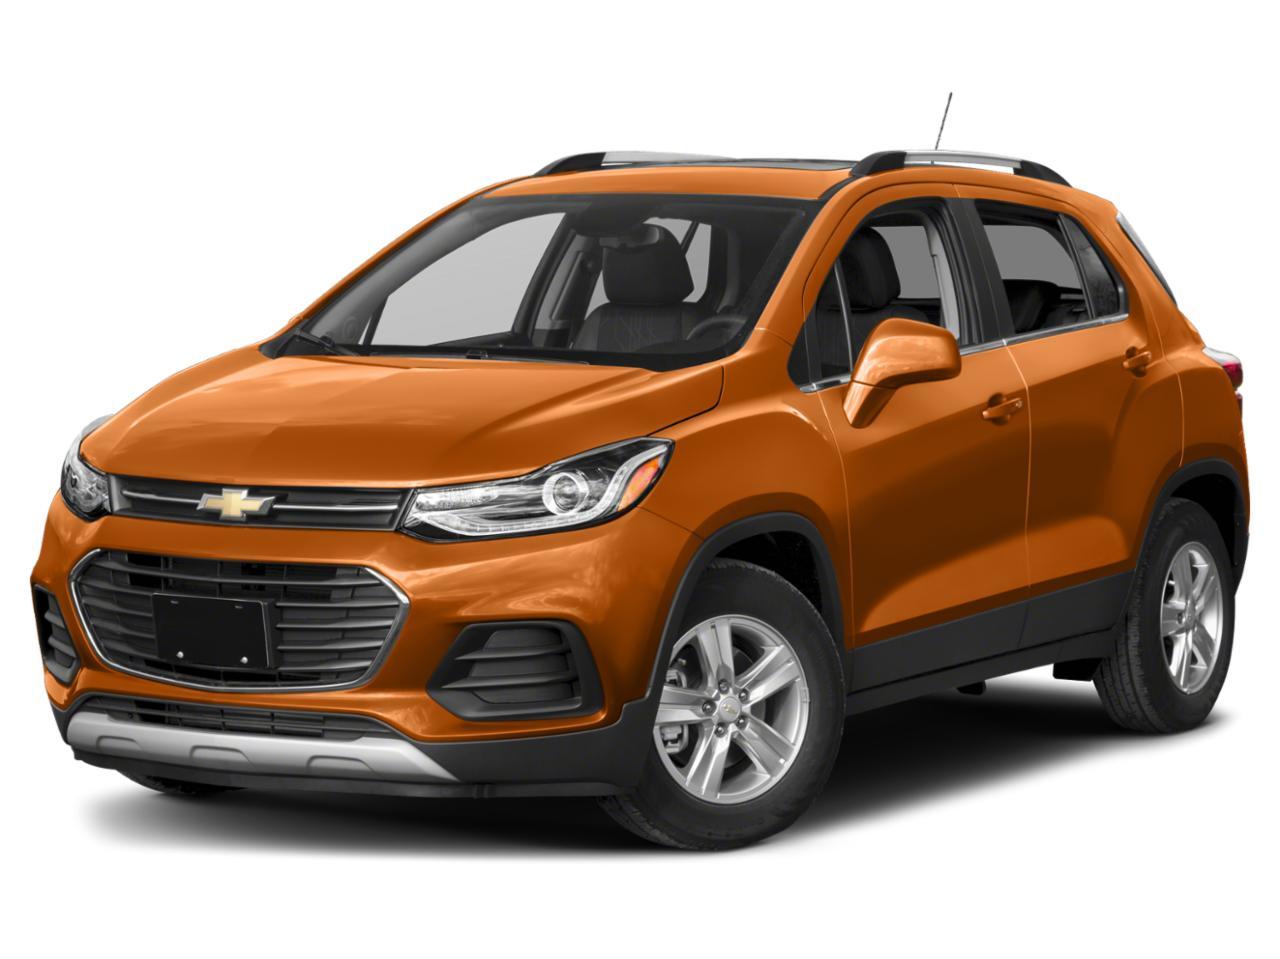 2019 Chevrolet Trax Vehicle Photo in Nashua, NH 03060